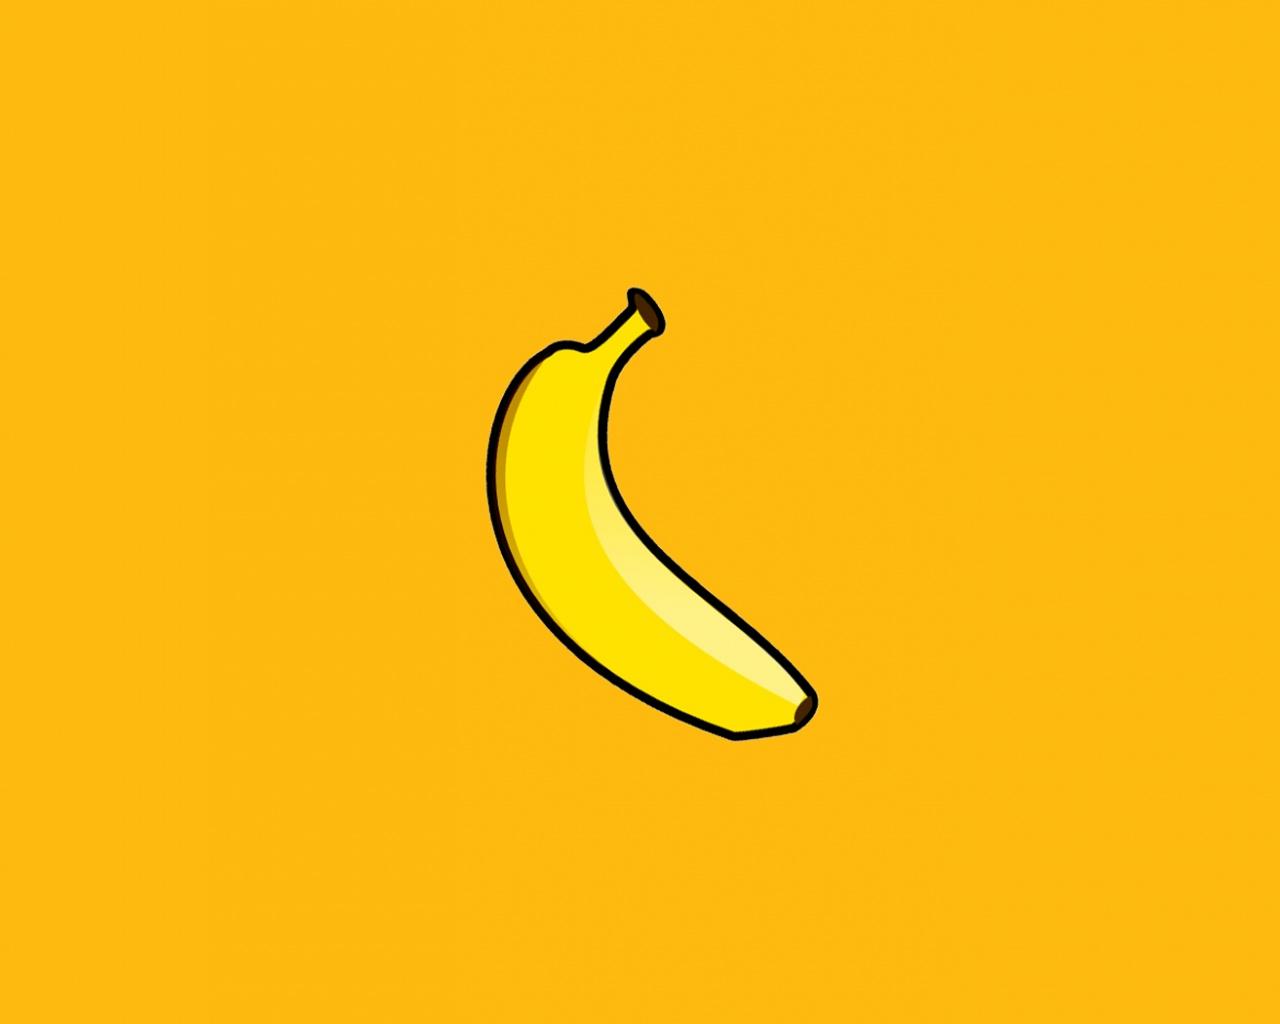 банан без смс